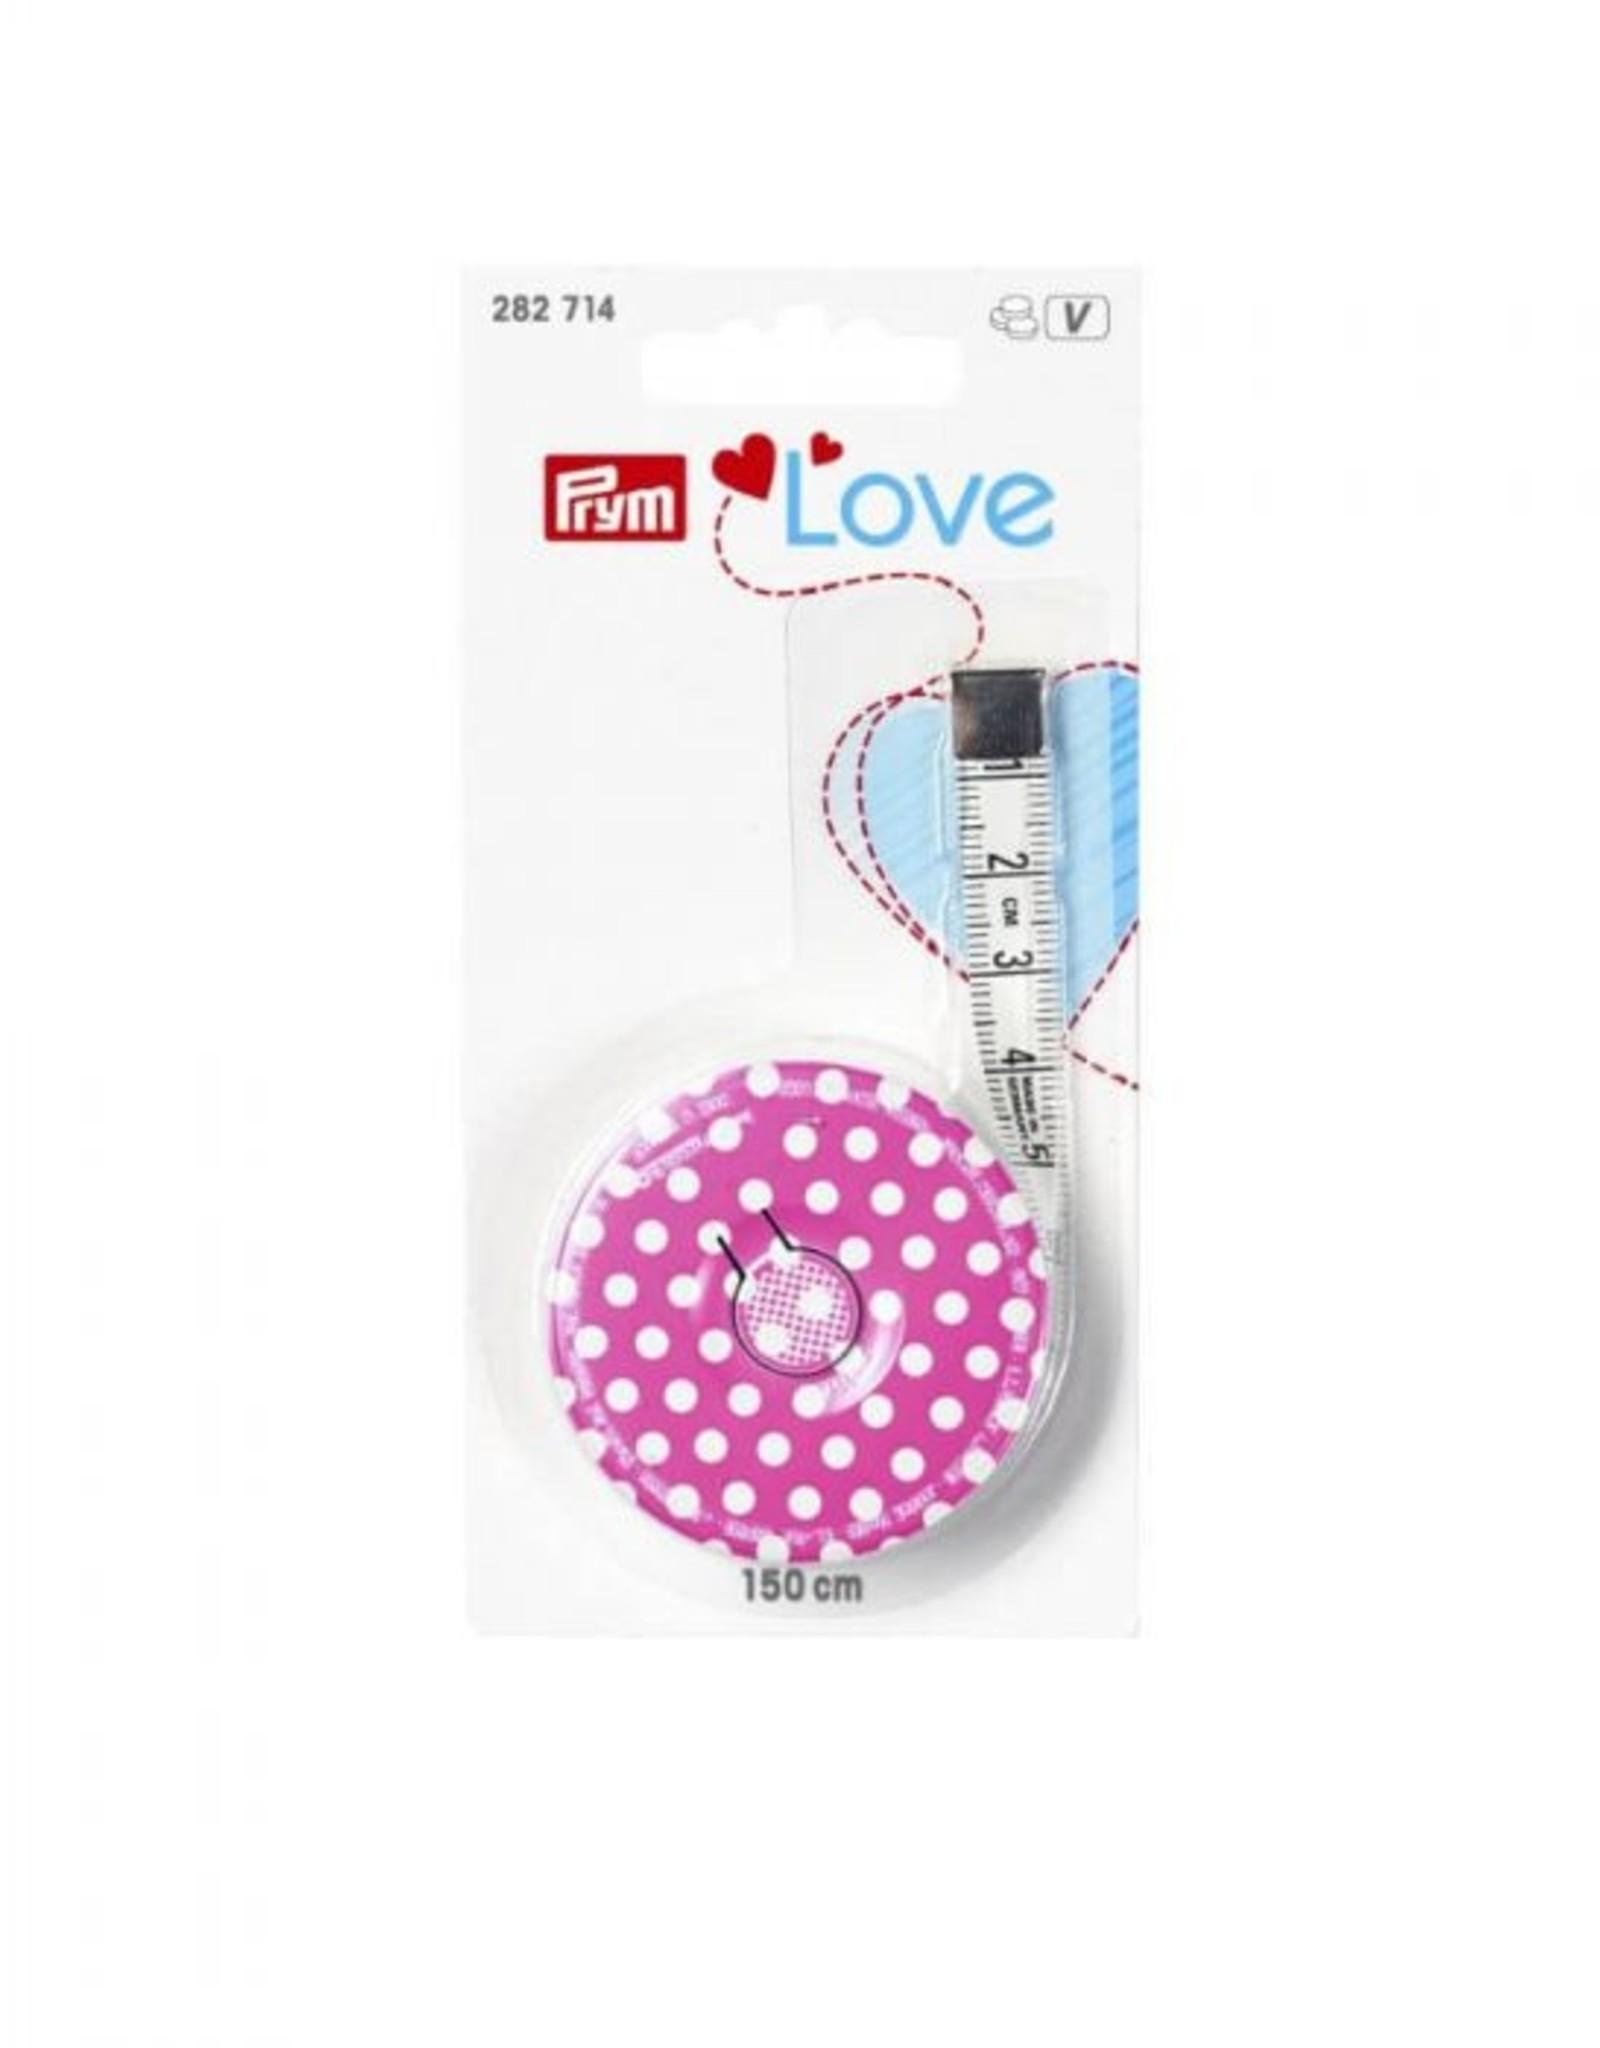 Prym Prym - Love rolcentimeter 150cm - 282 714